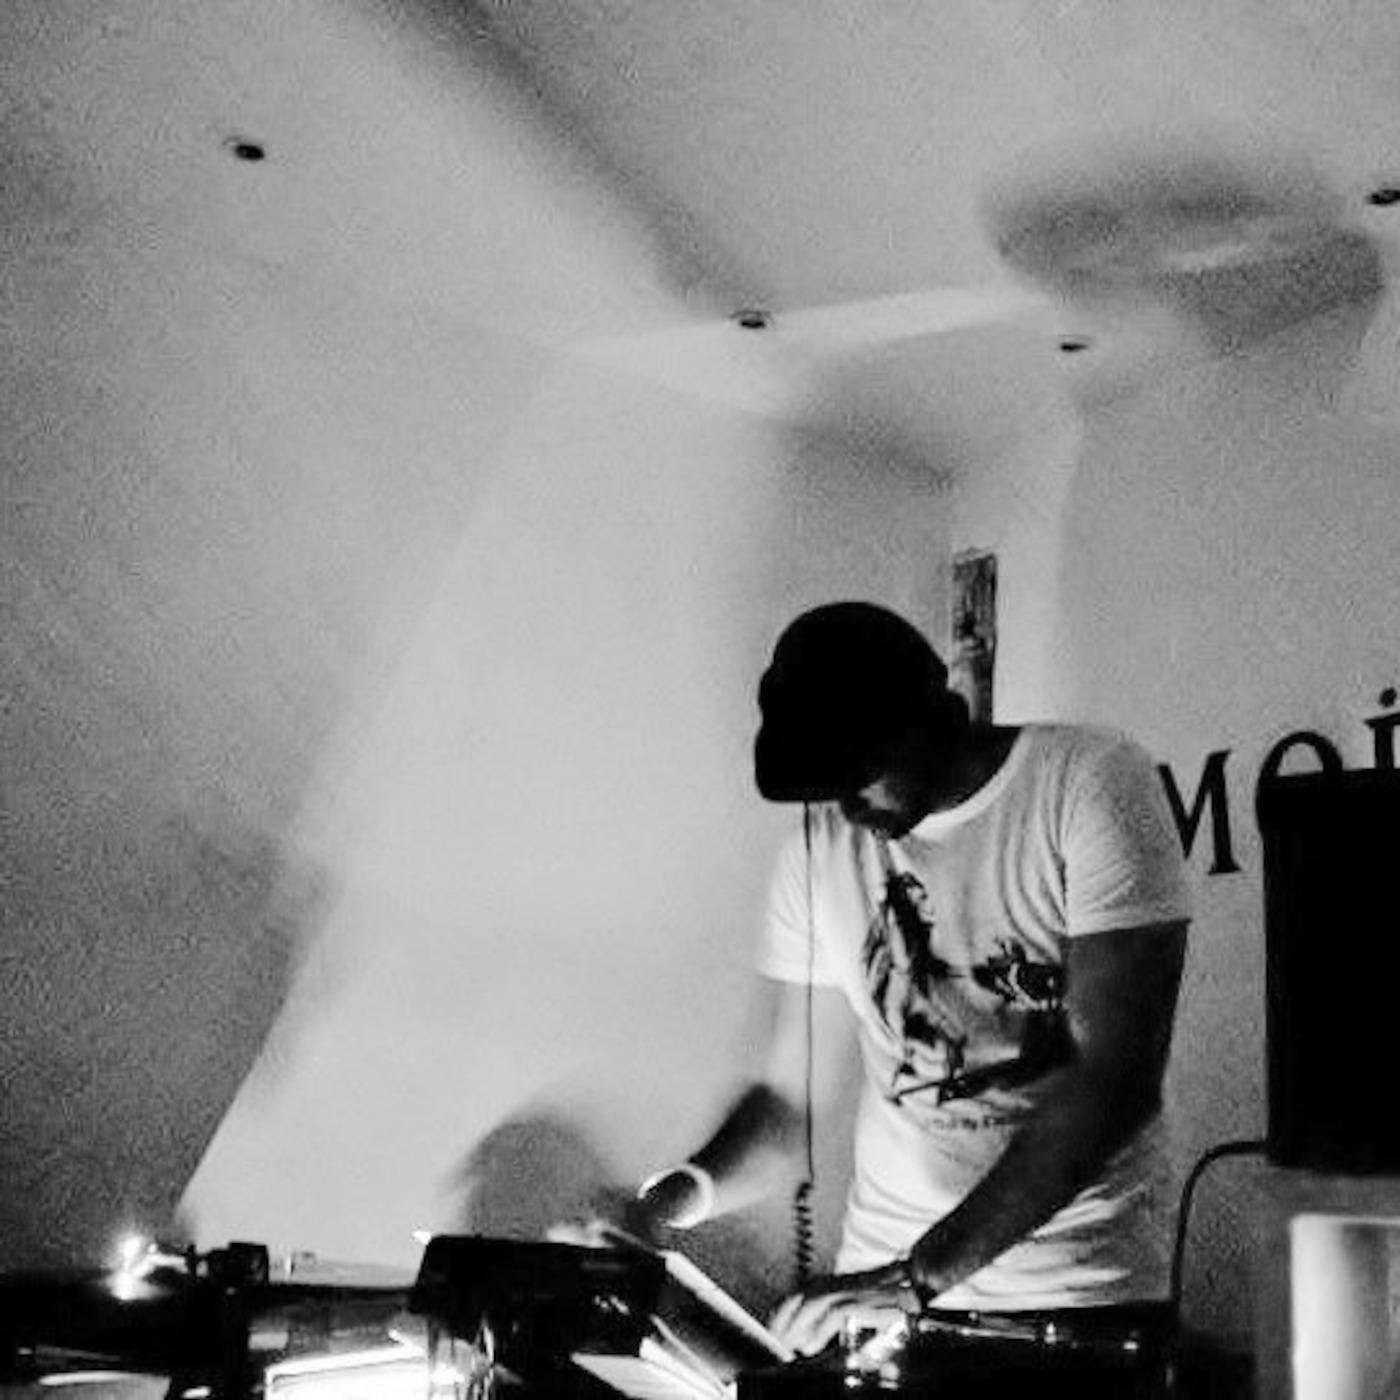 house'n'deep ibiza mixes 2015